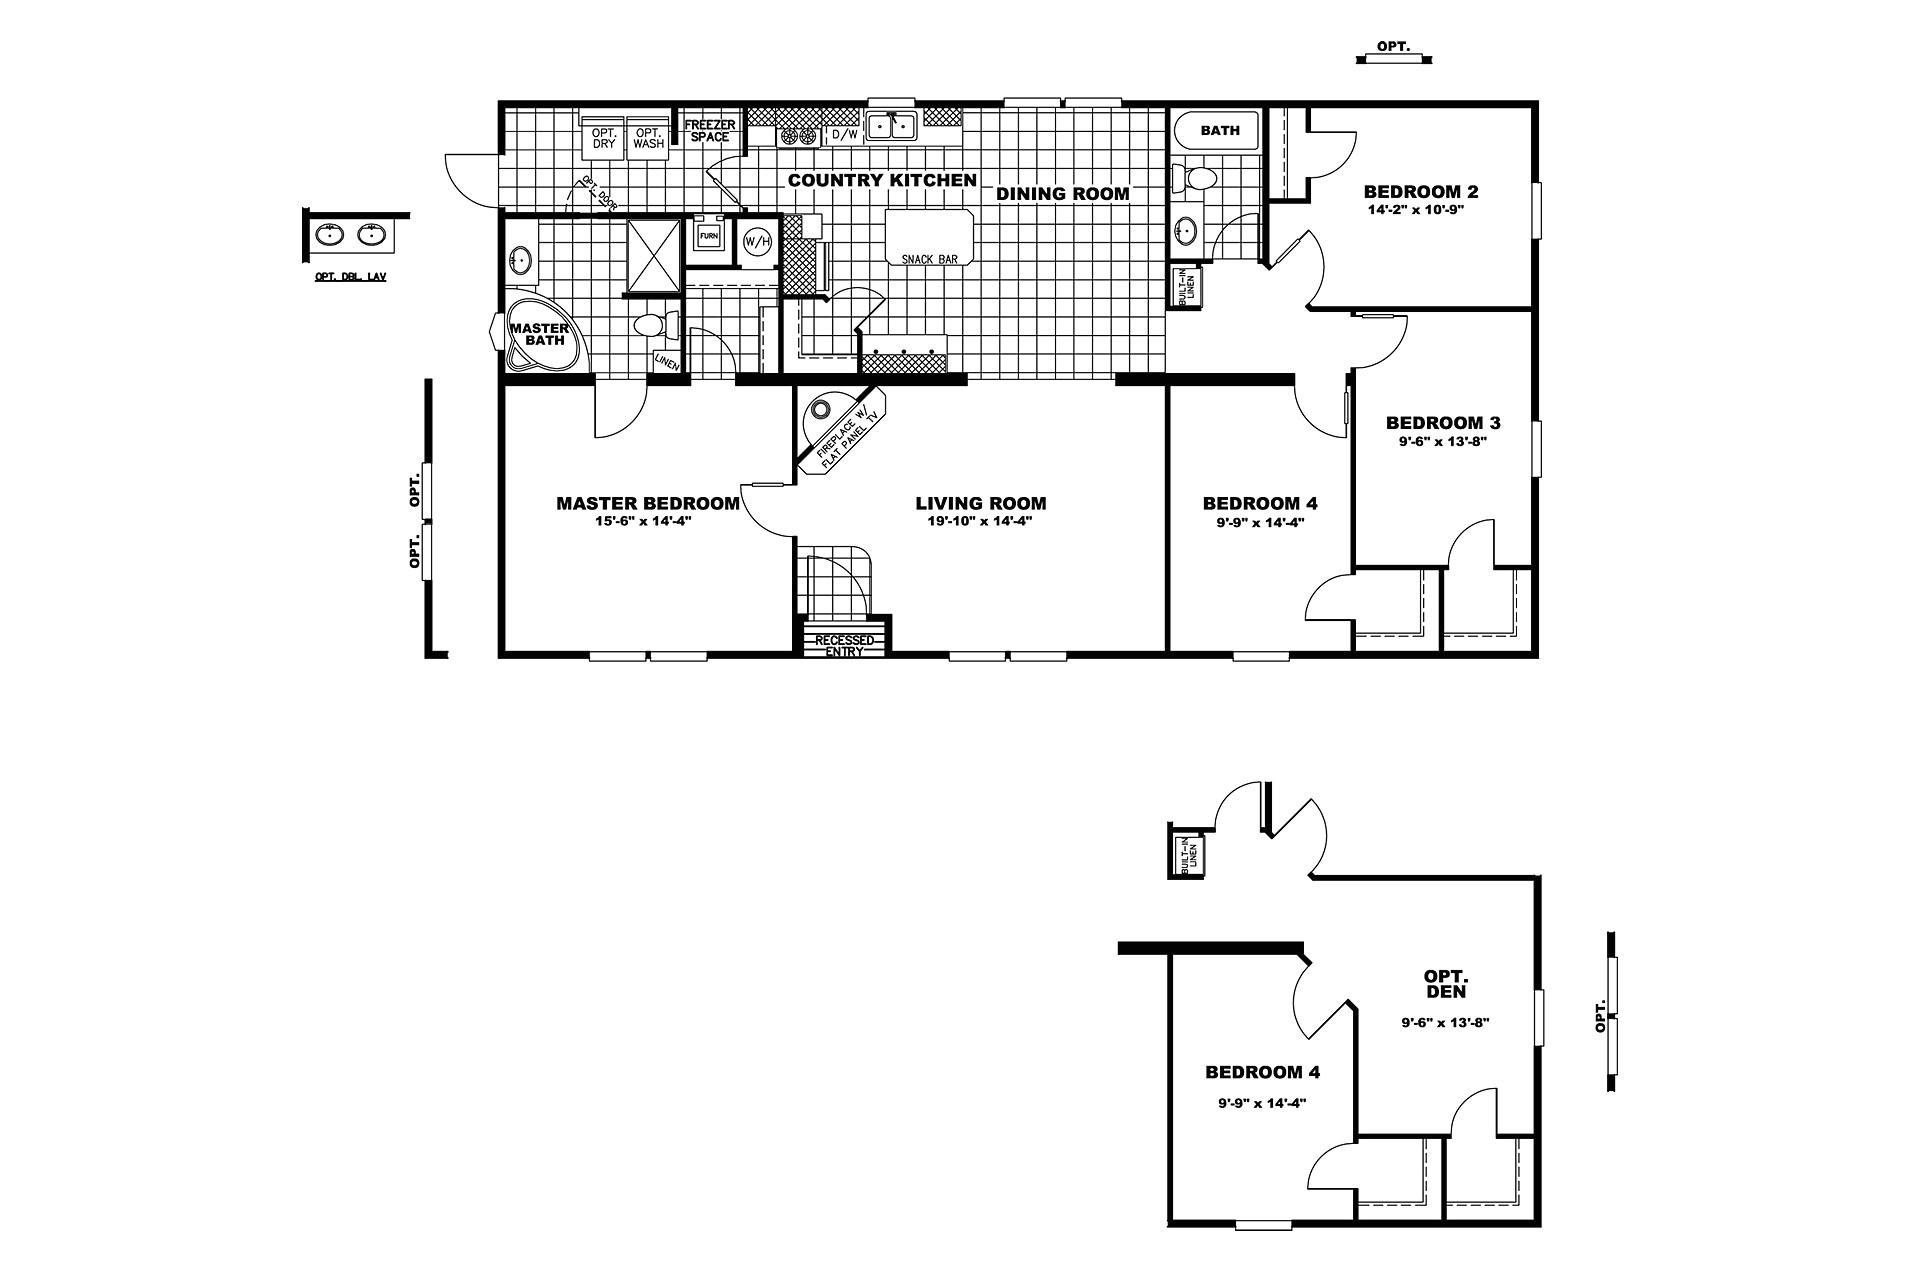 clayton cowboy house sse 164318 2